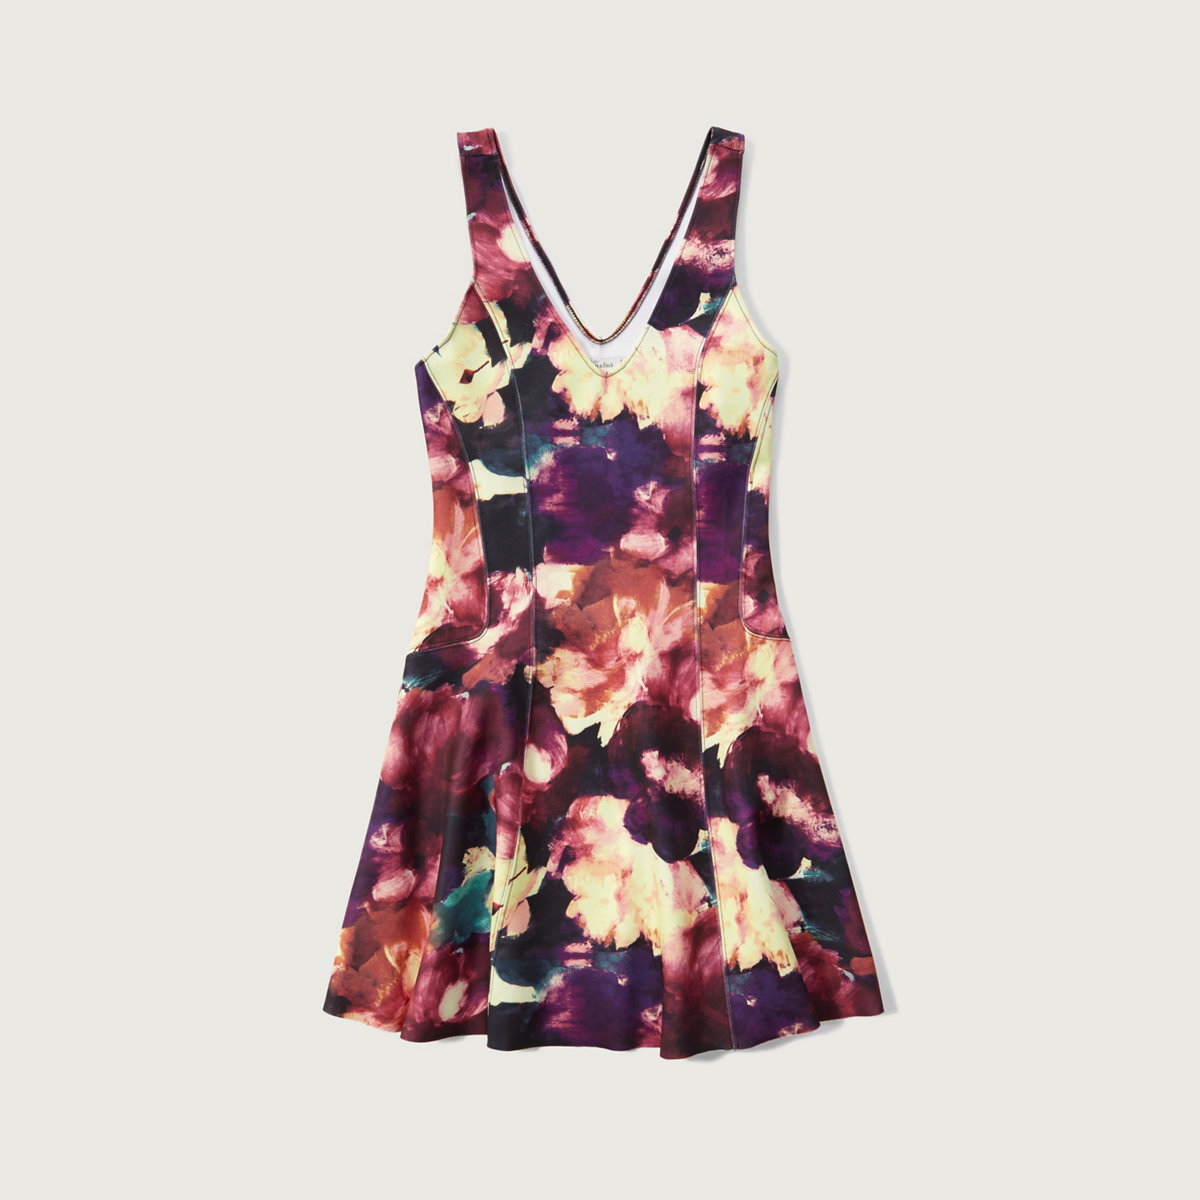 Floral Neoprene Dress